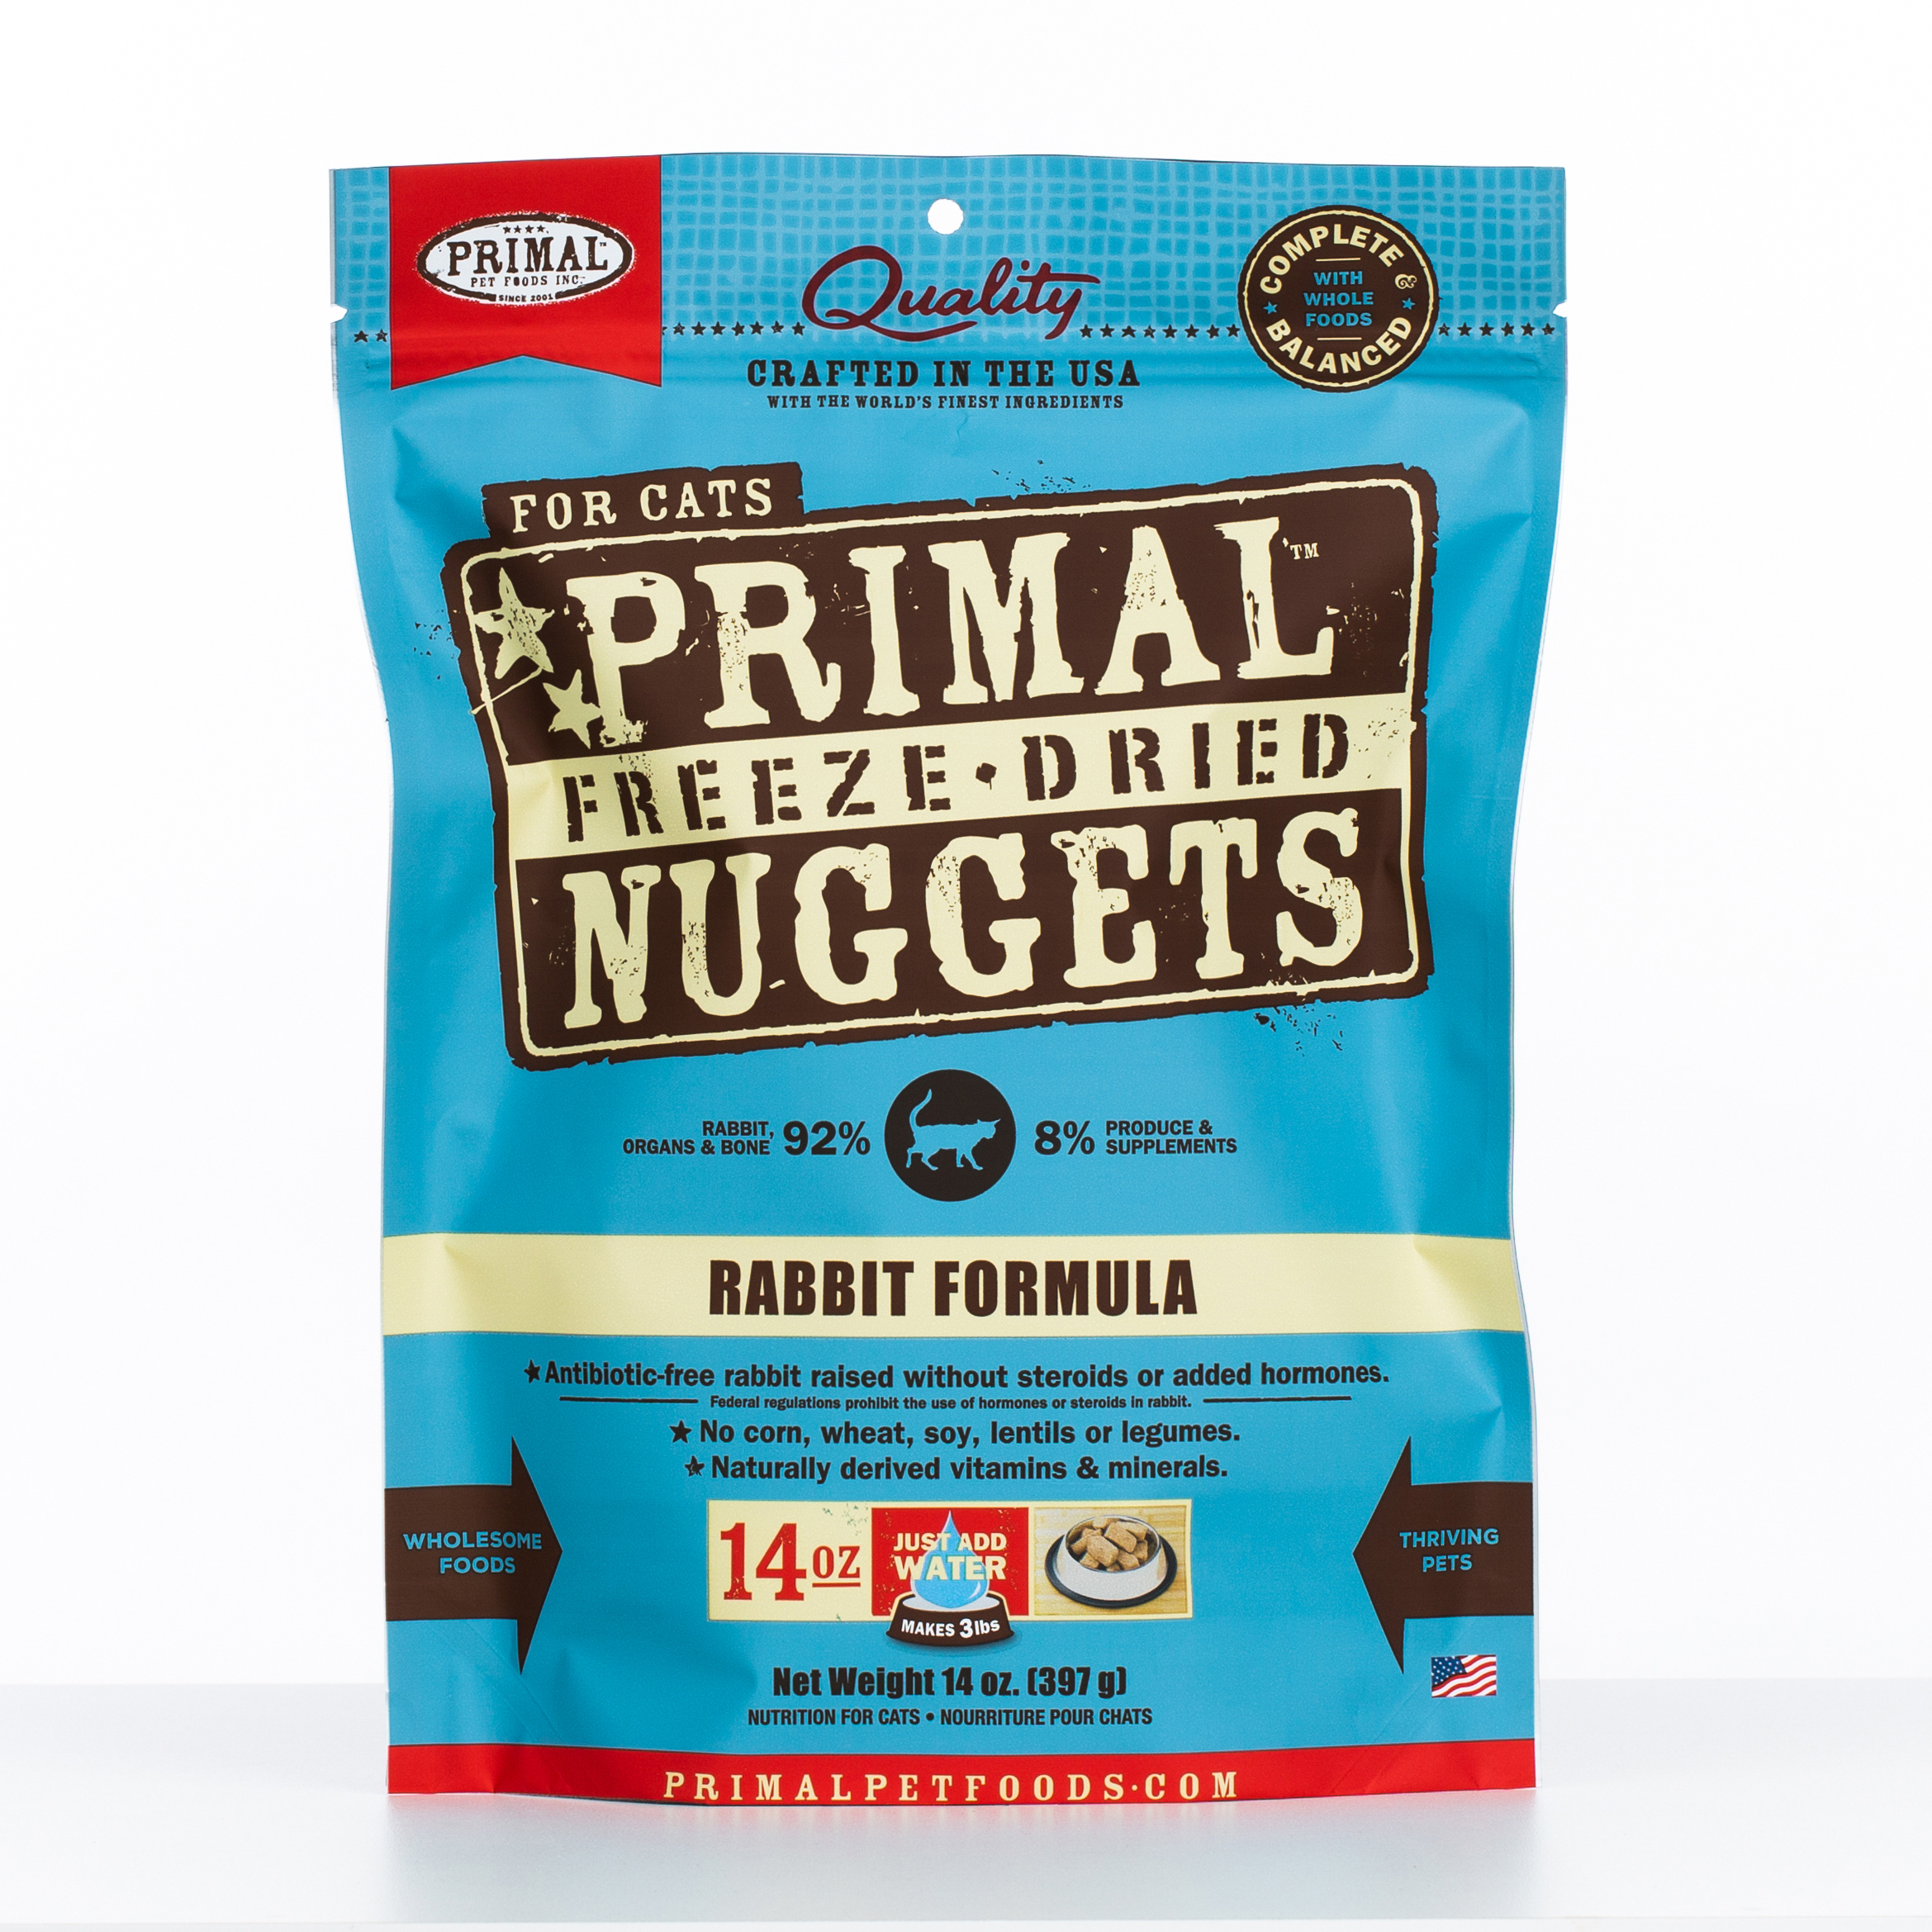 Primal Raw Freeze-Dried Nuggets Rabbit Formula Cat Food, 14-oz bag